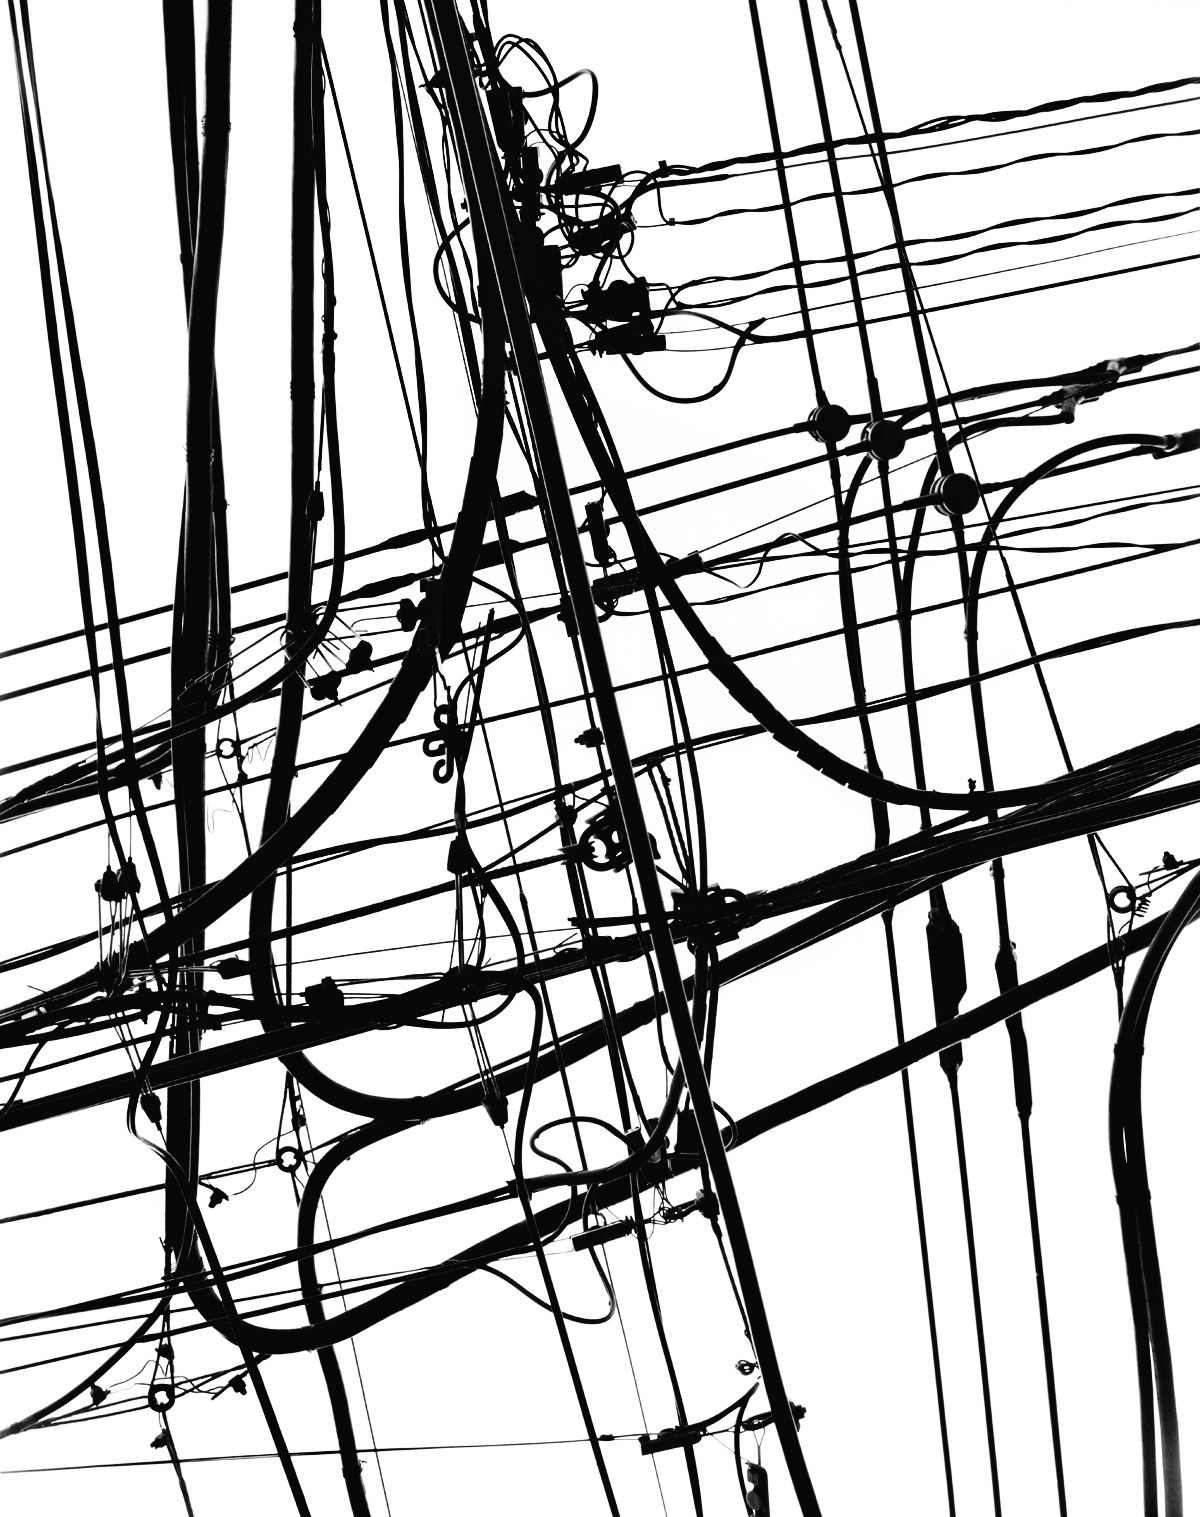 Pin by Pierre-Yves Demarcq on B&W | Pinterest | Telephone ...